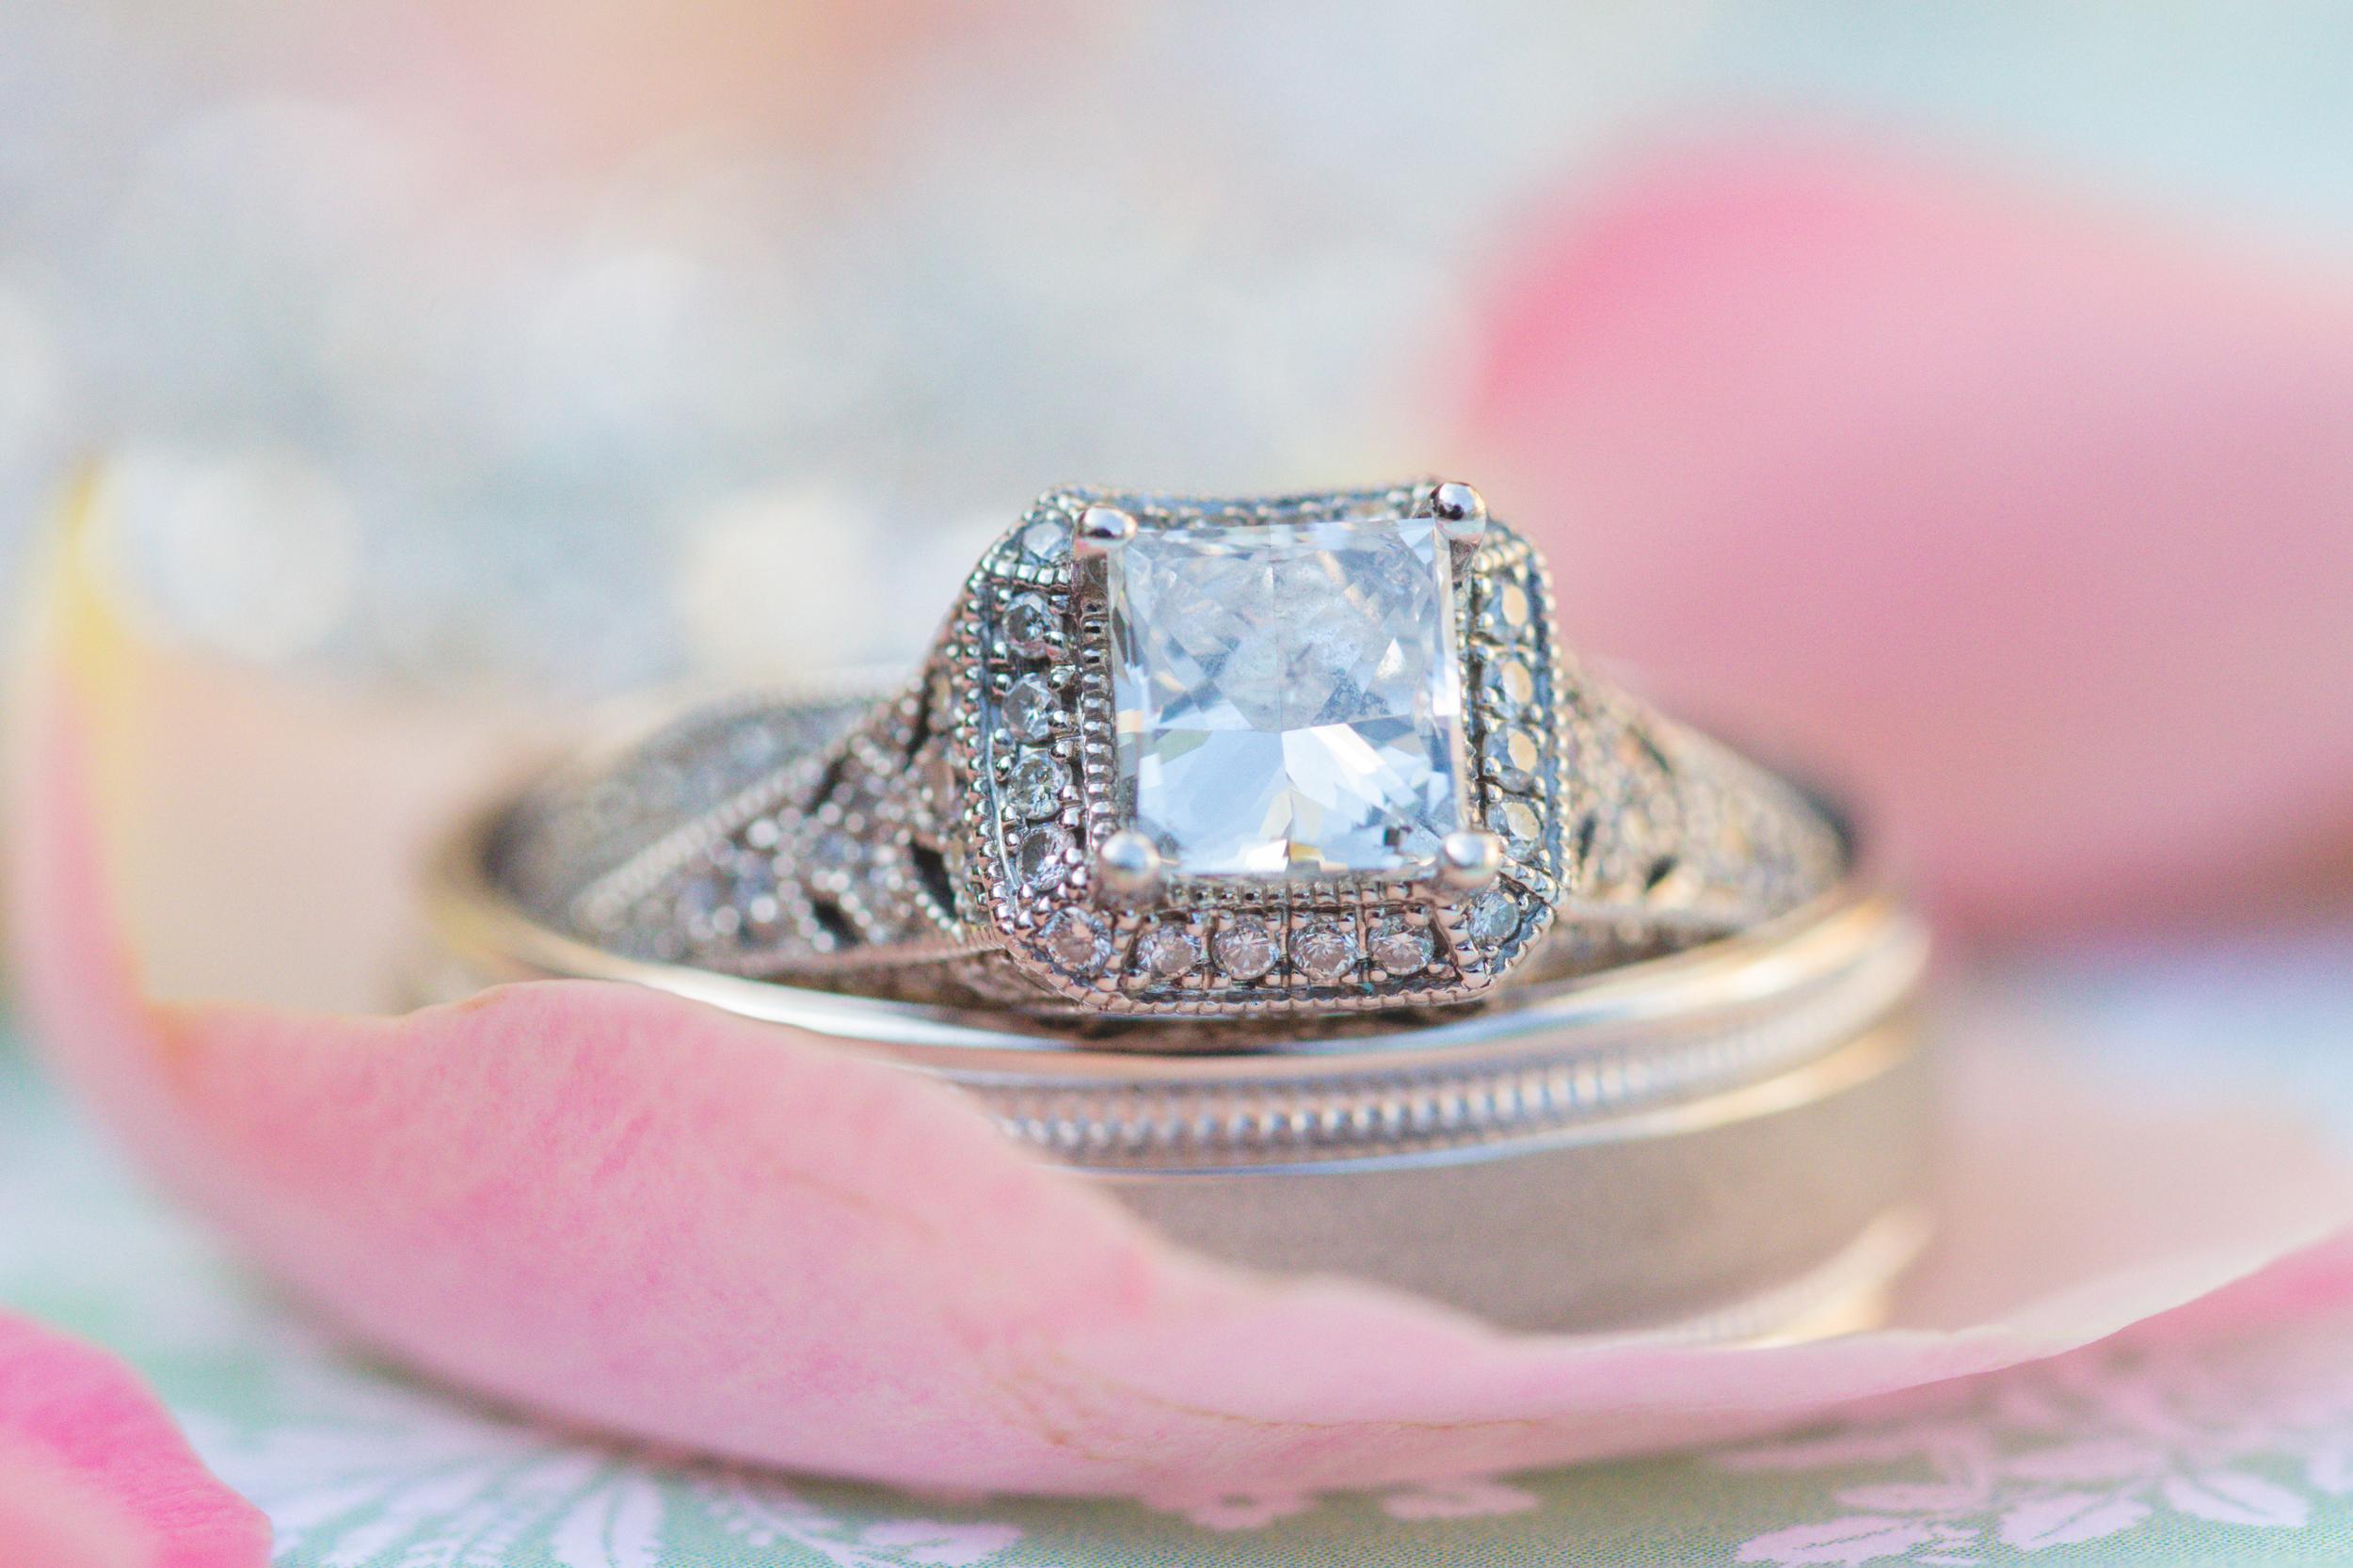 Hough_Wedding_North_Carolina_Charlotte_JonCourvillePhotography-26.jpg